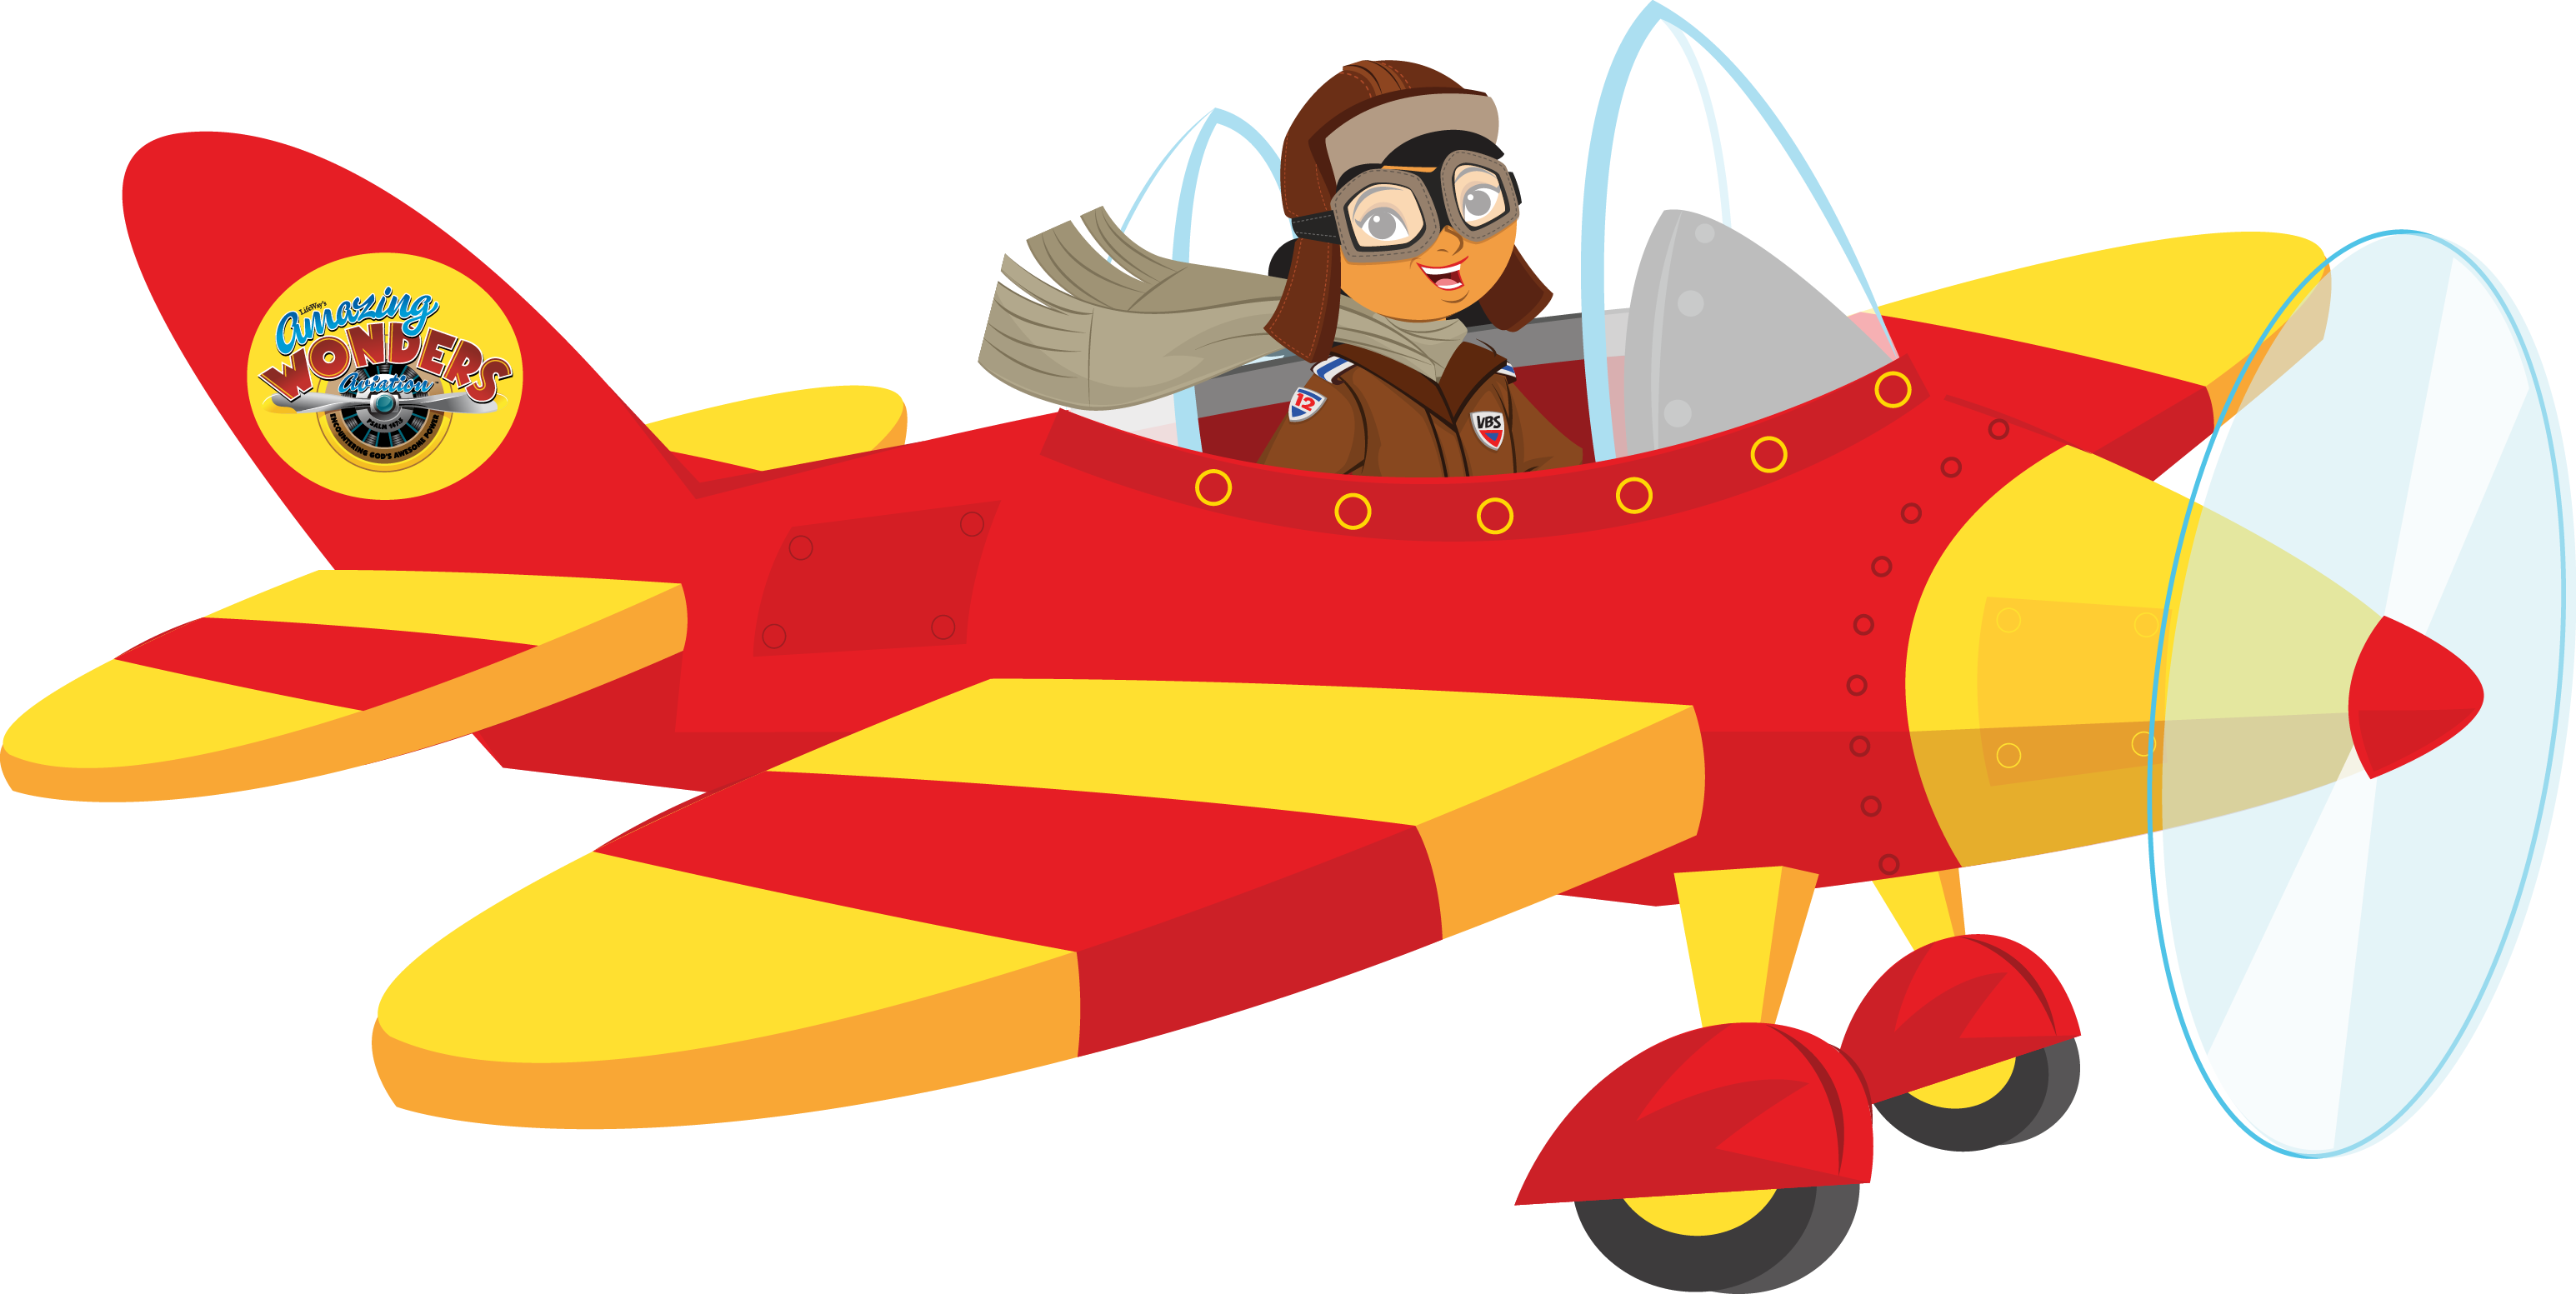 Clipart Plane - Cliparts.co